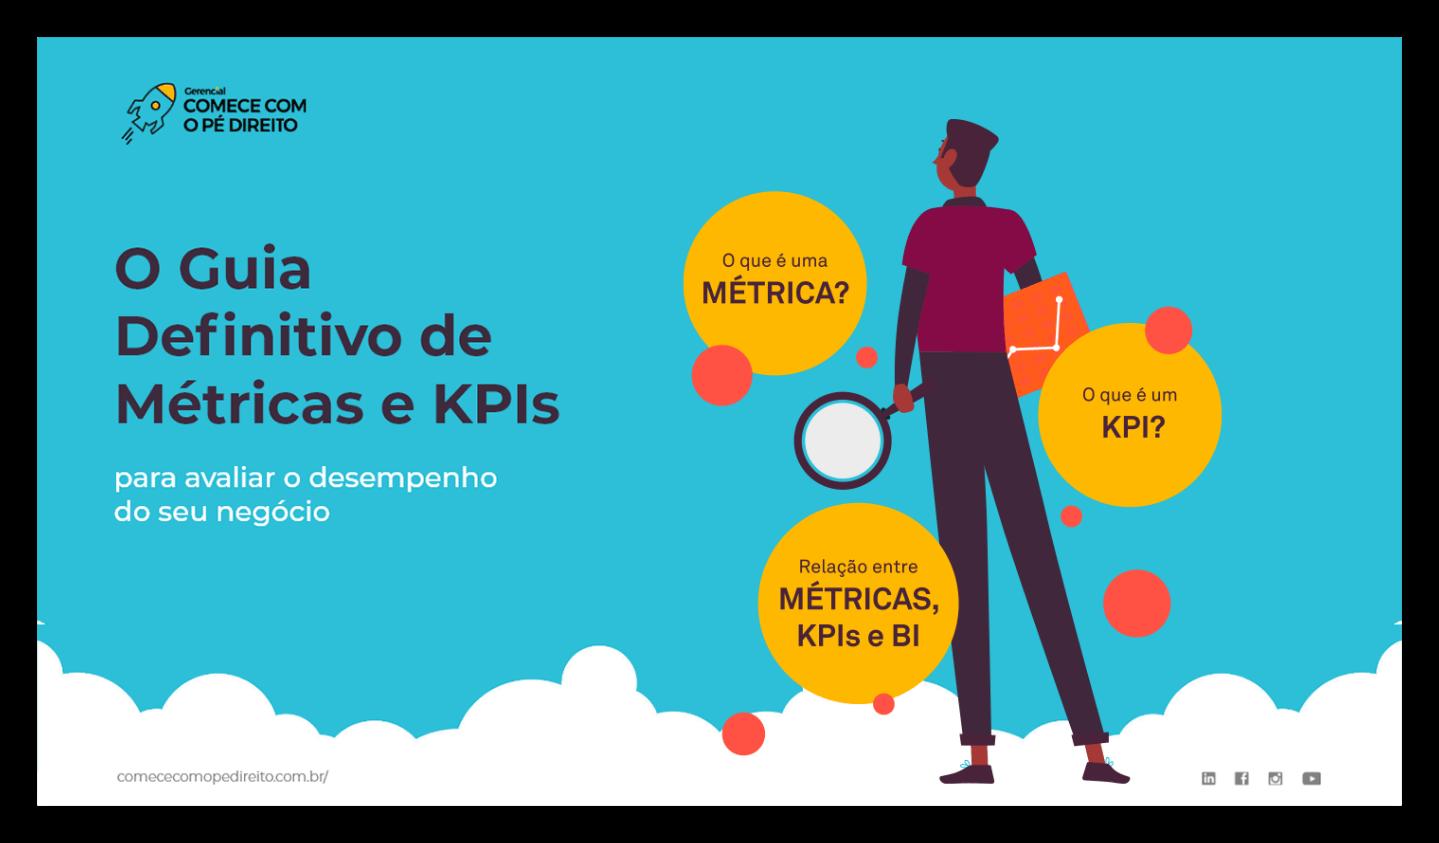 Guias definitivo de Métricas de KPIs